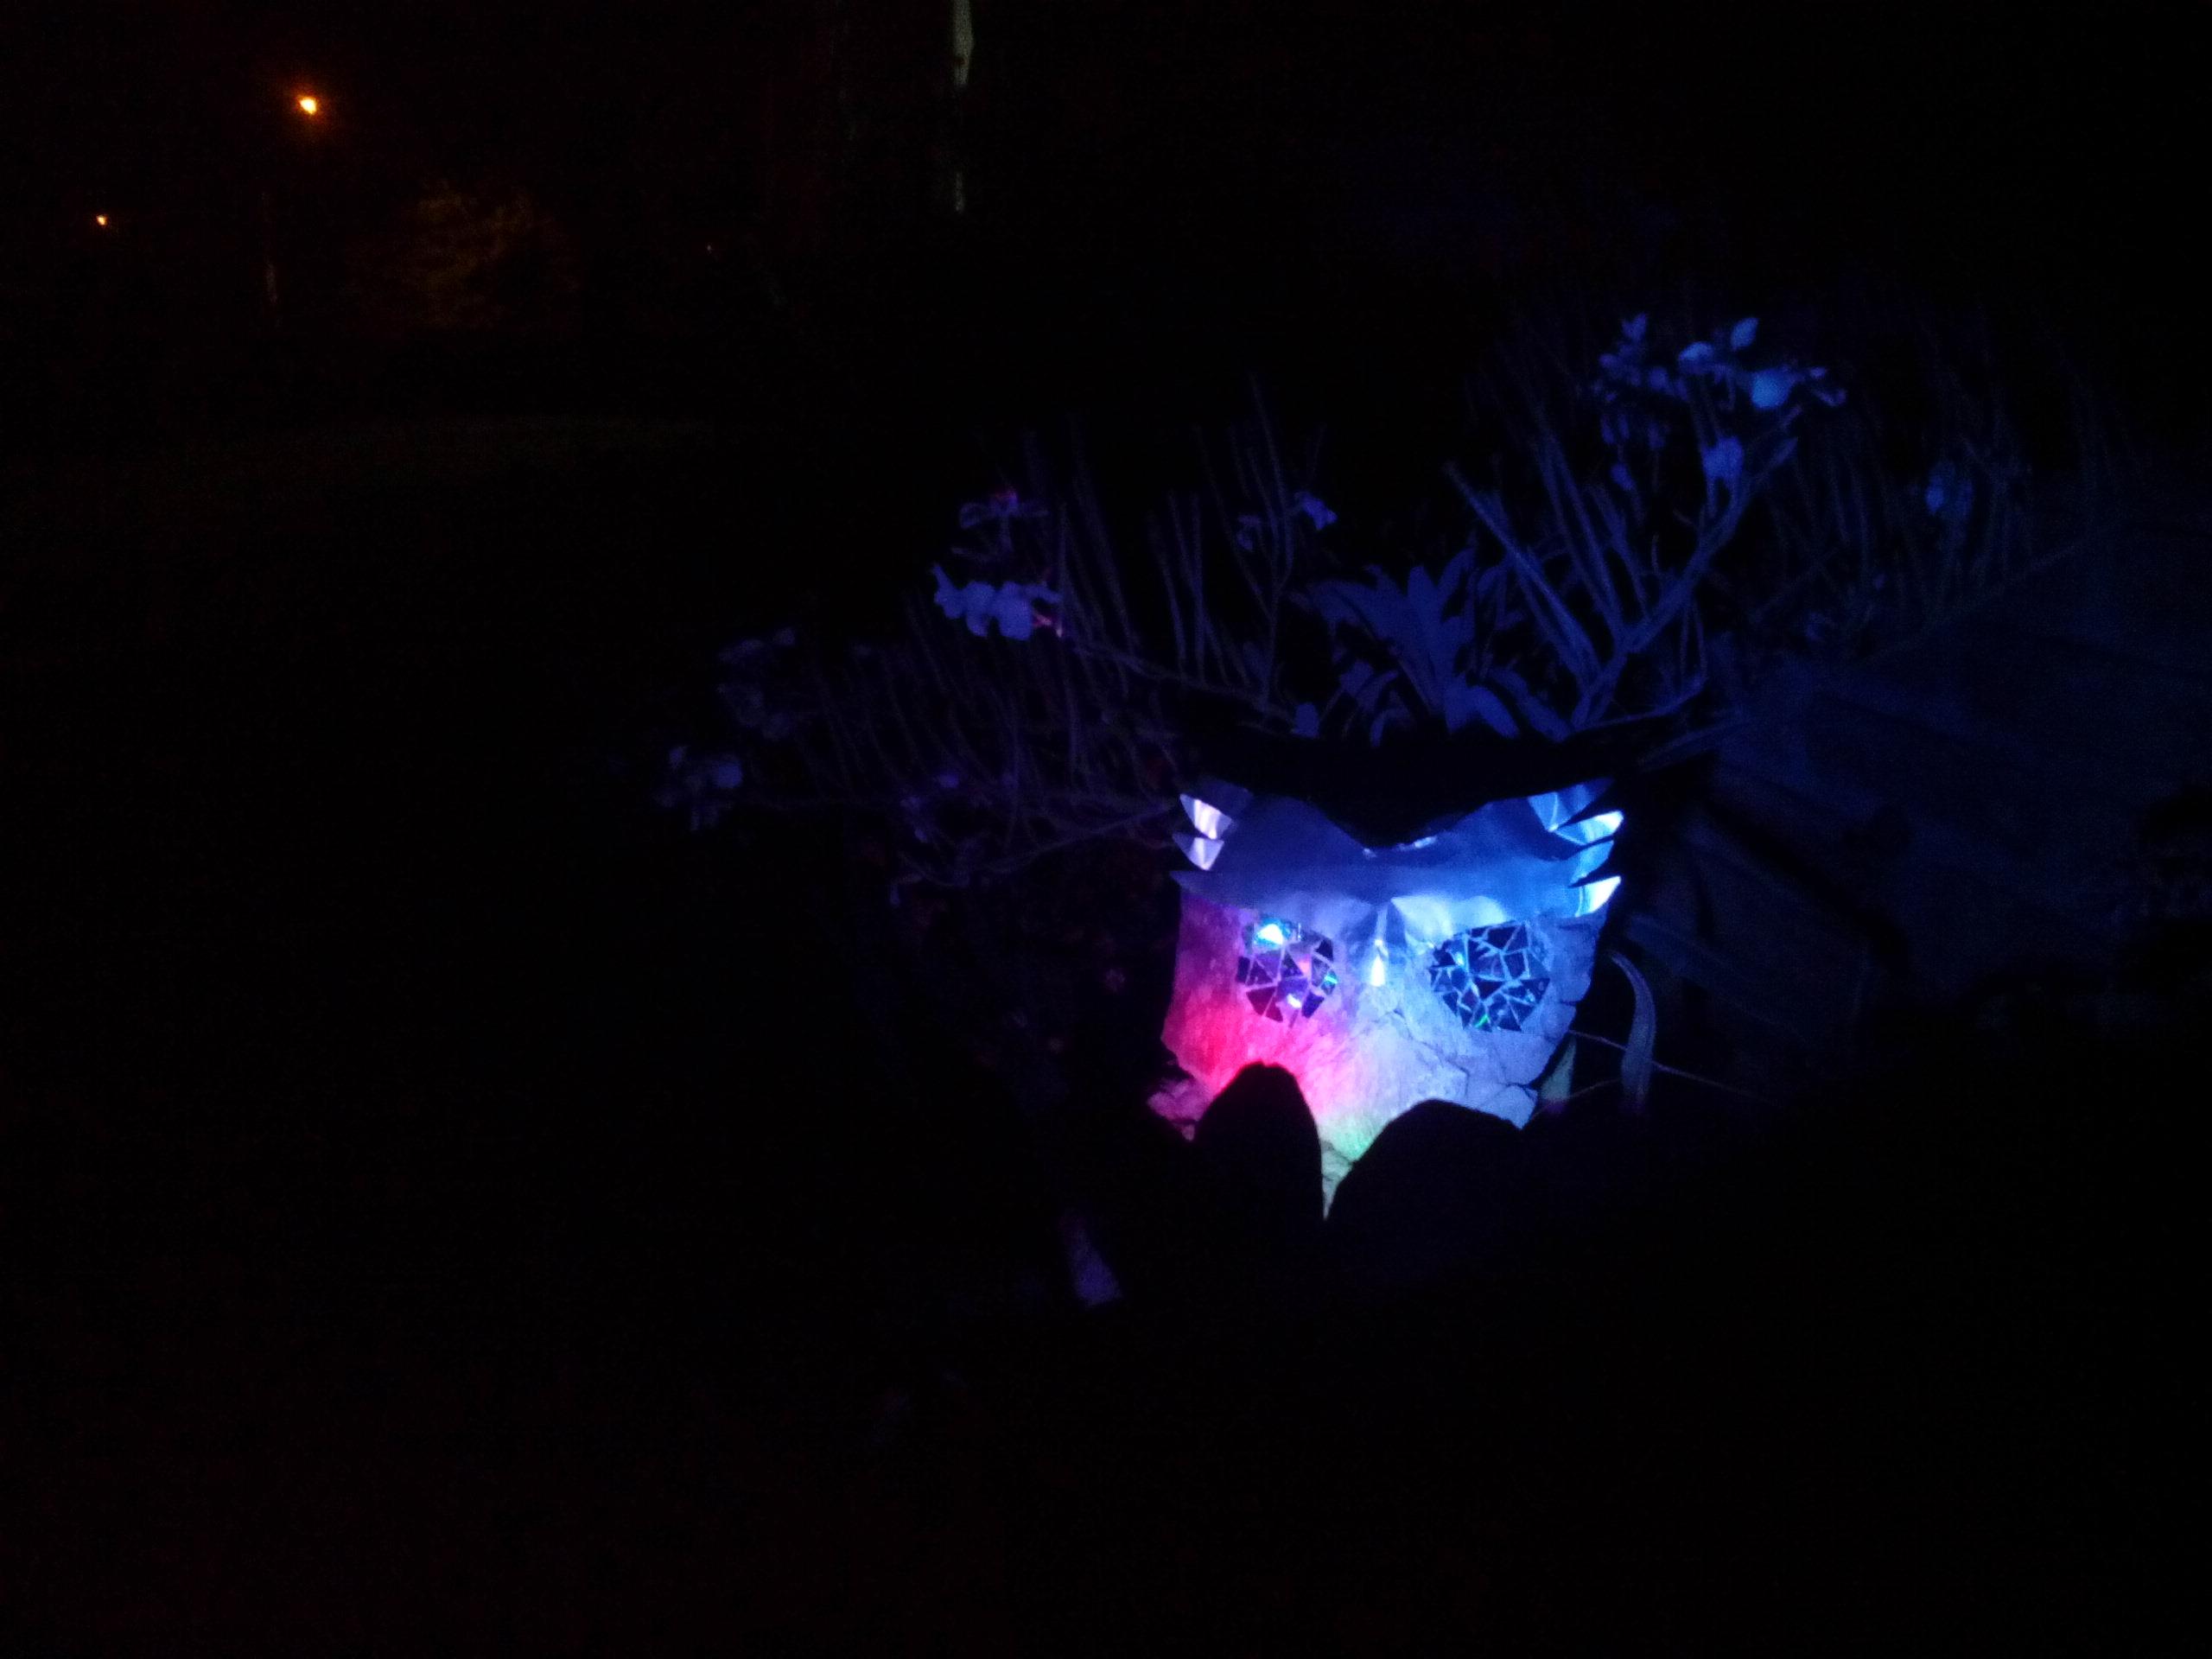 FRIGHTENING STONE OWL